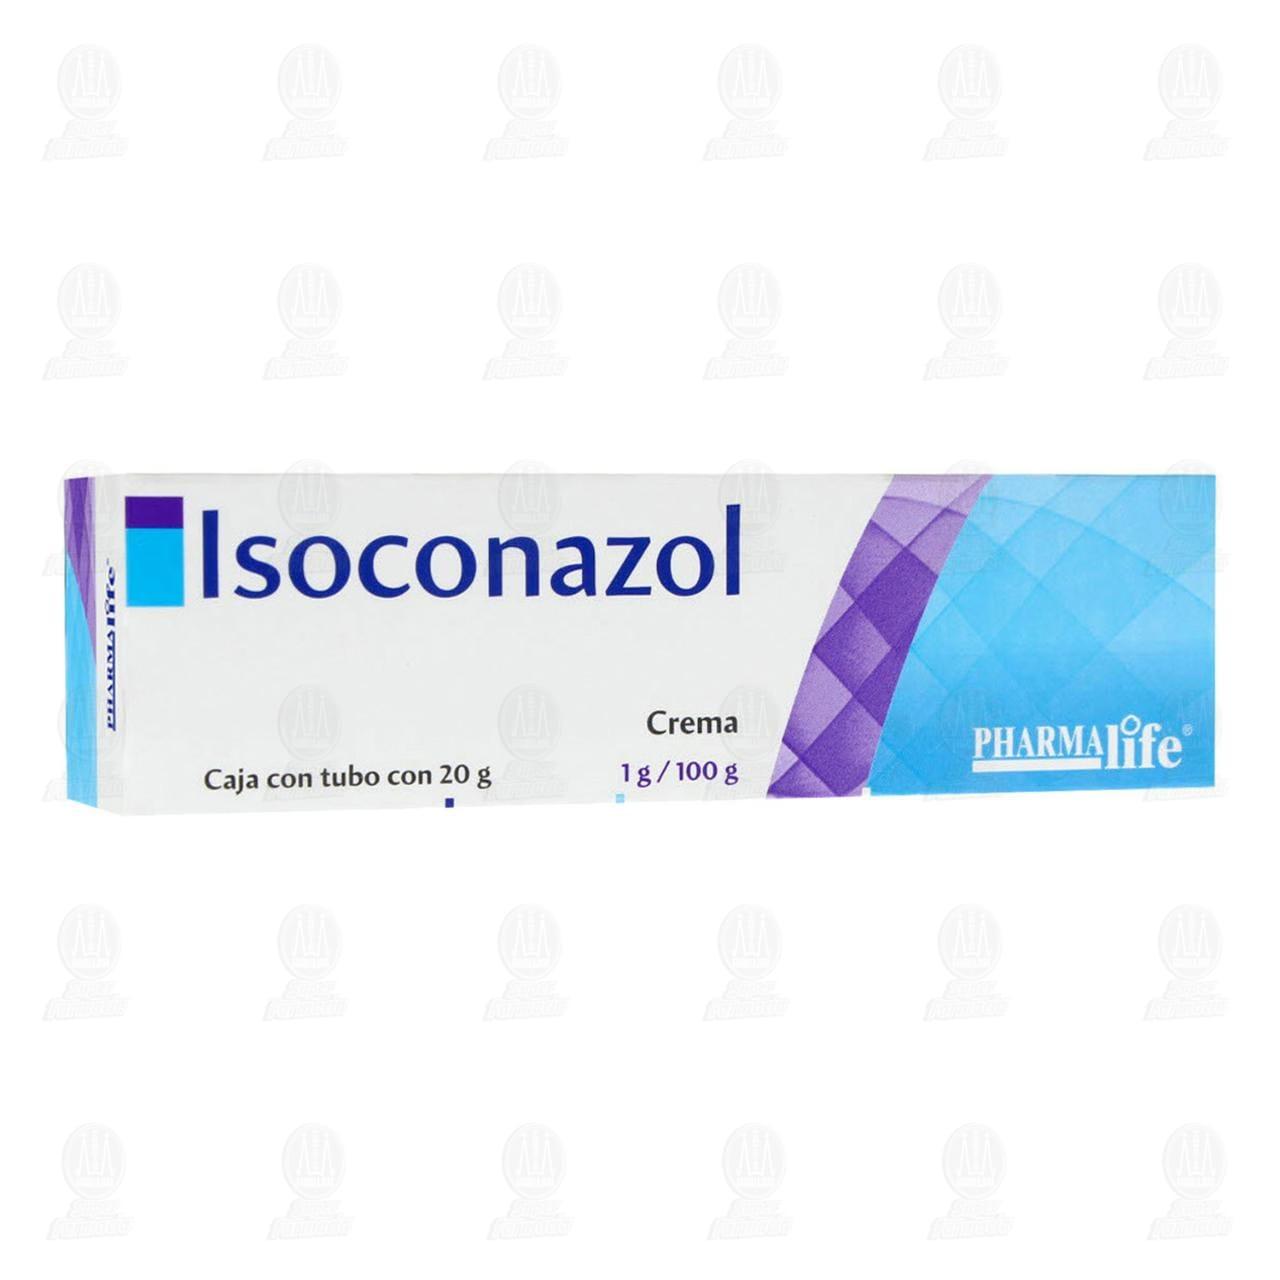 Comprar Isoconazol 1g/100g Crema 20g Pharmalife en Farmacias Guadalajara